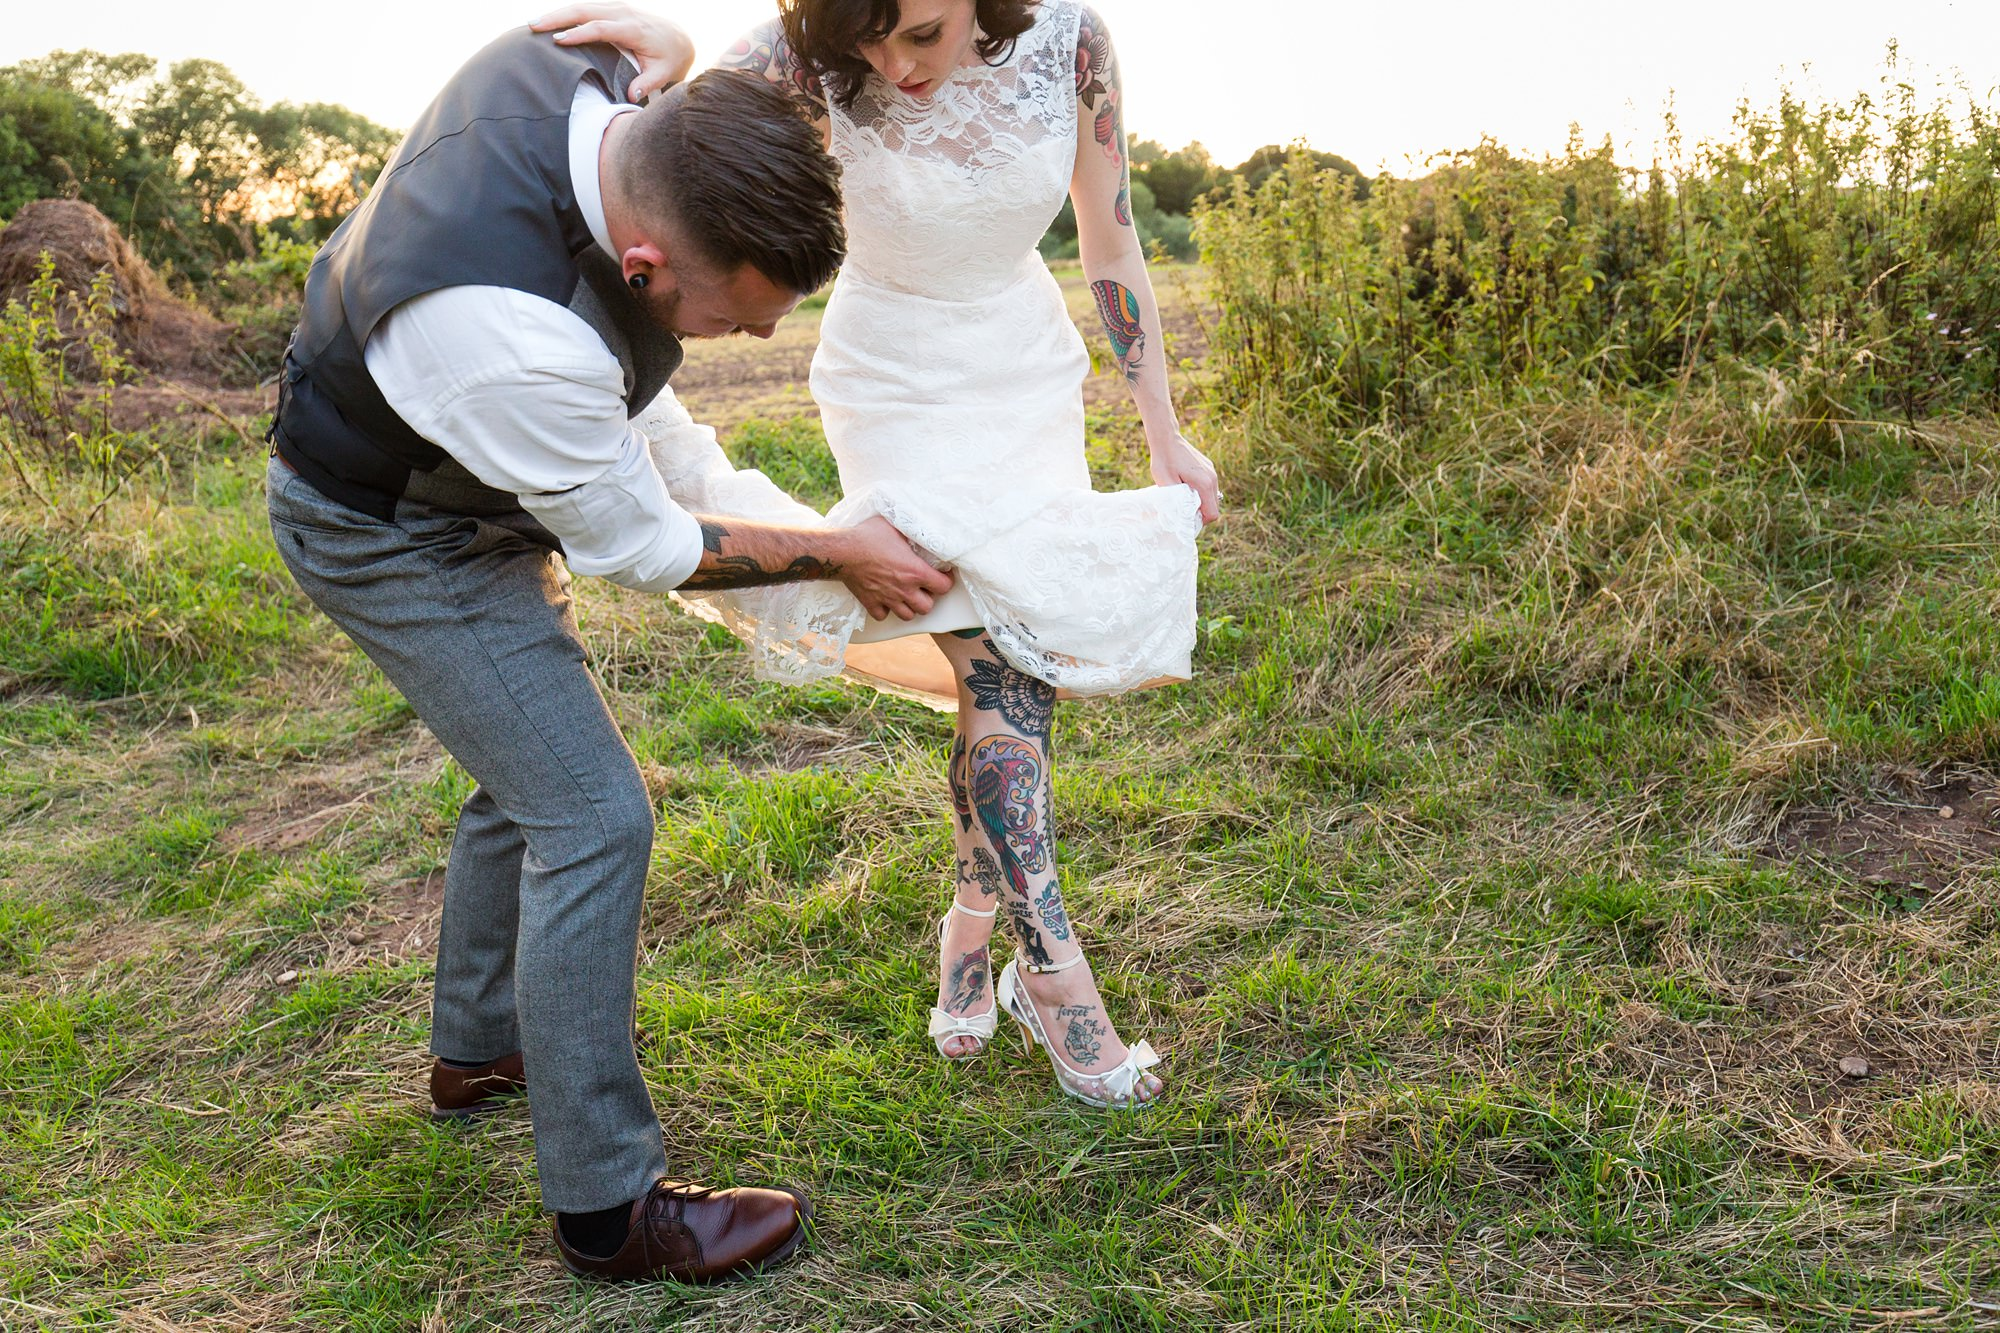 Tattooed groom helps bride sort out her dress tattooed legs